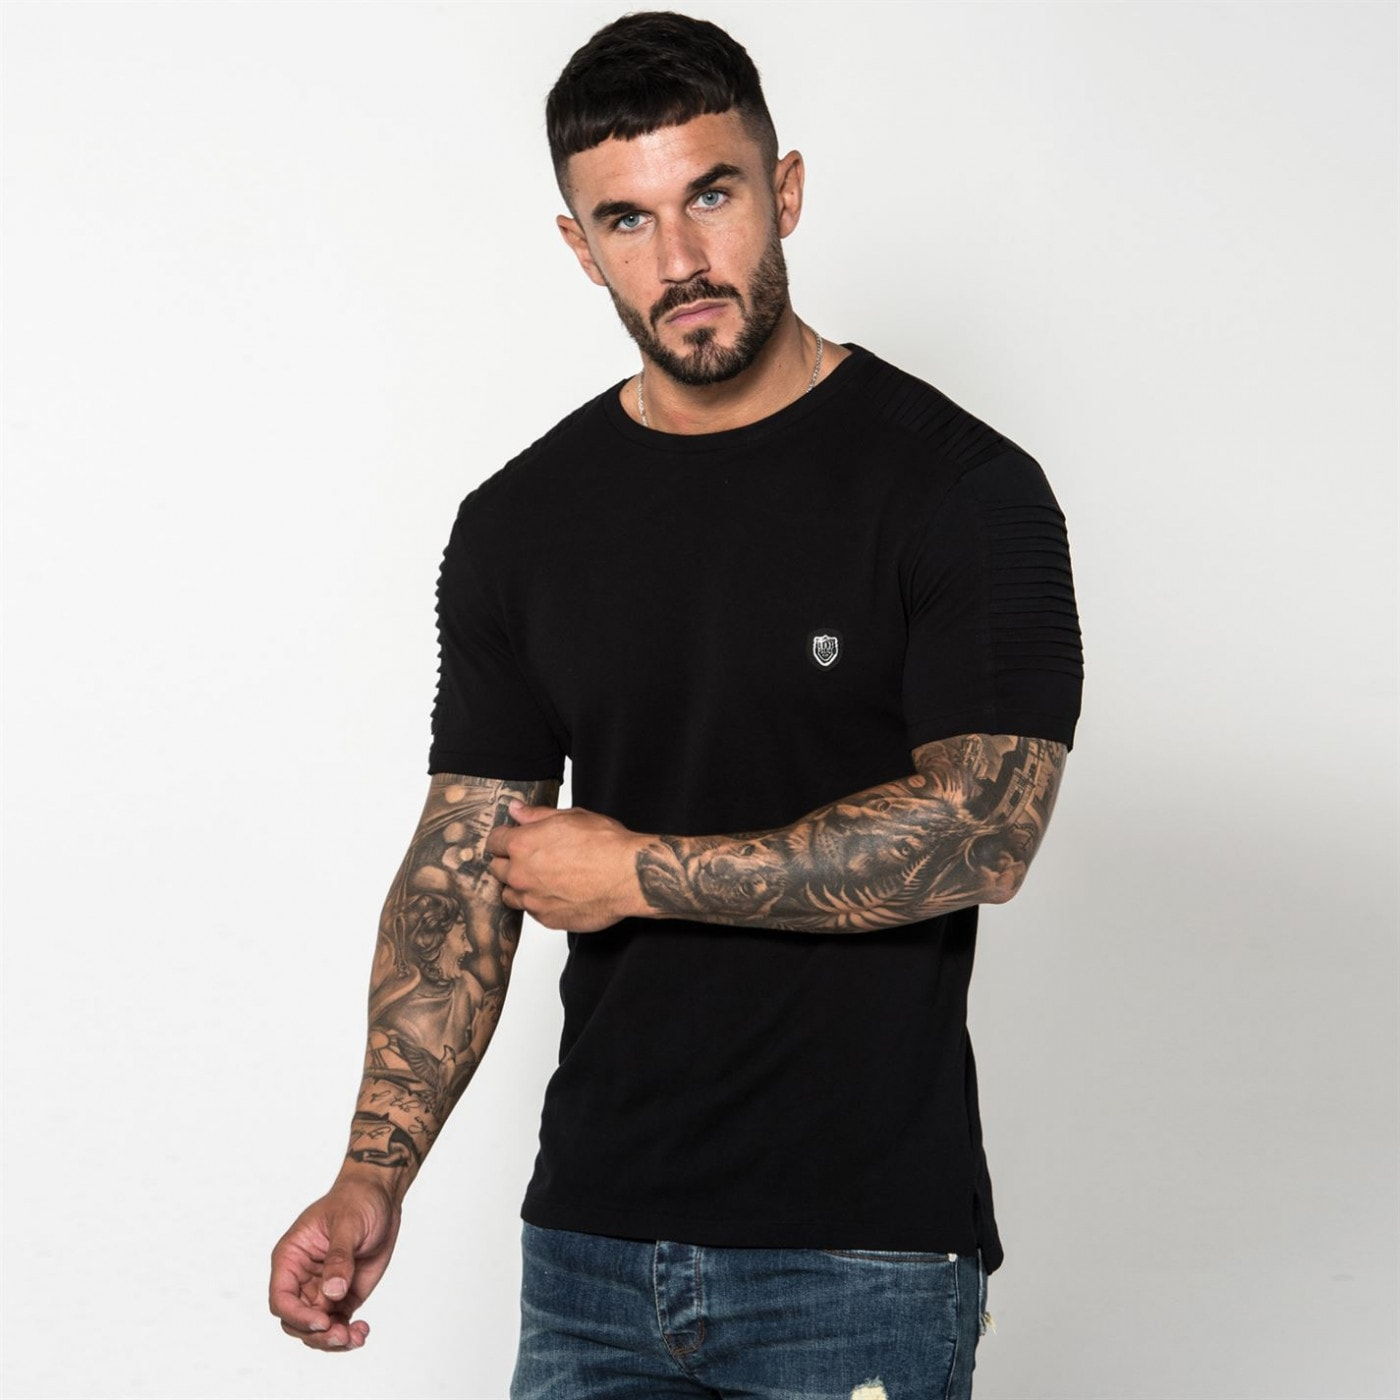 883 Police Pavia T Shirt